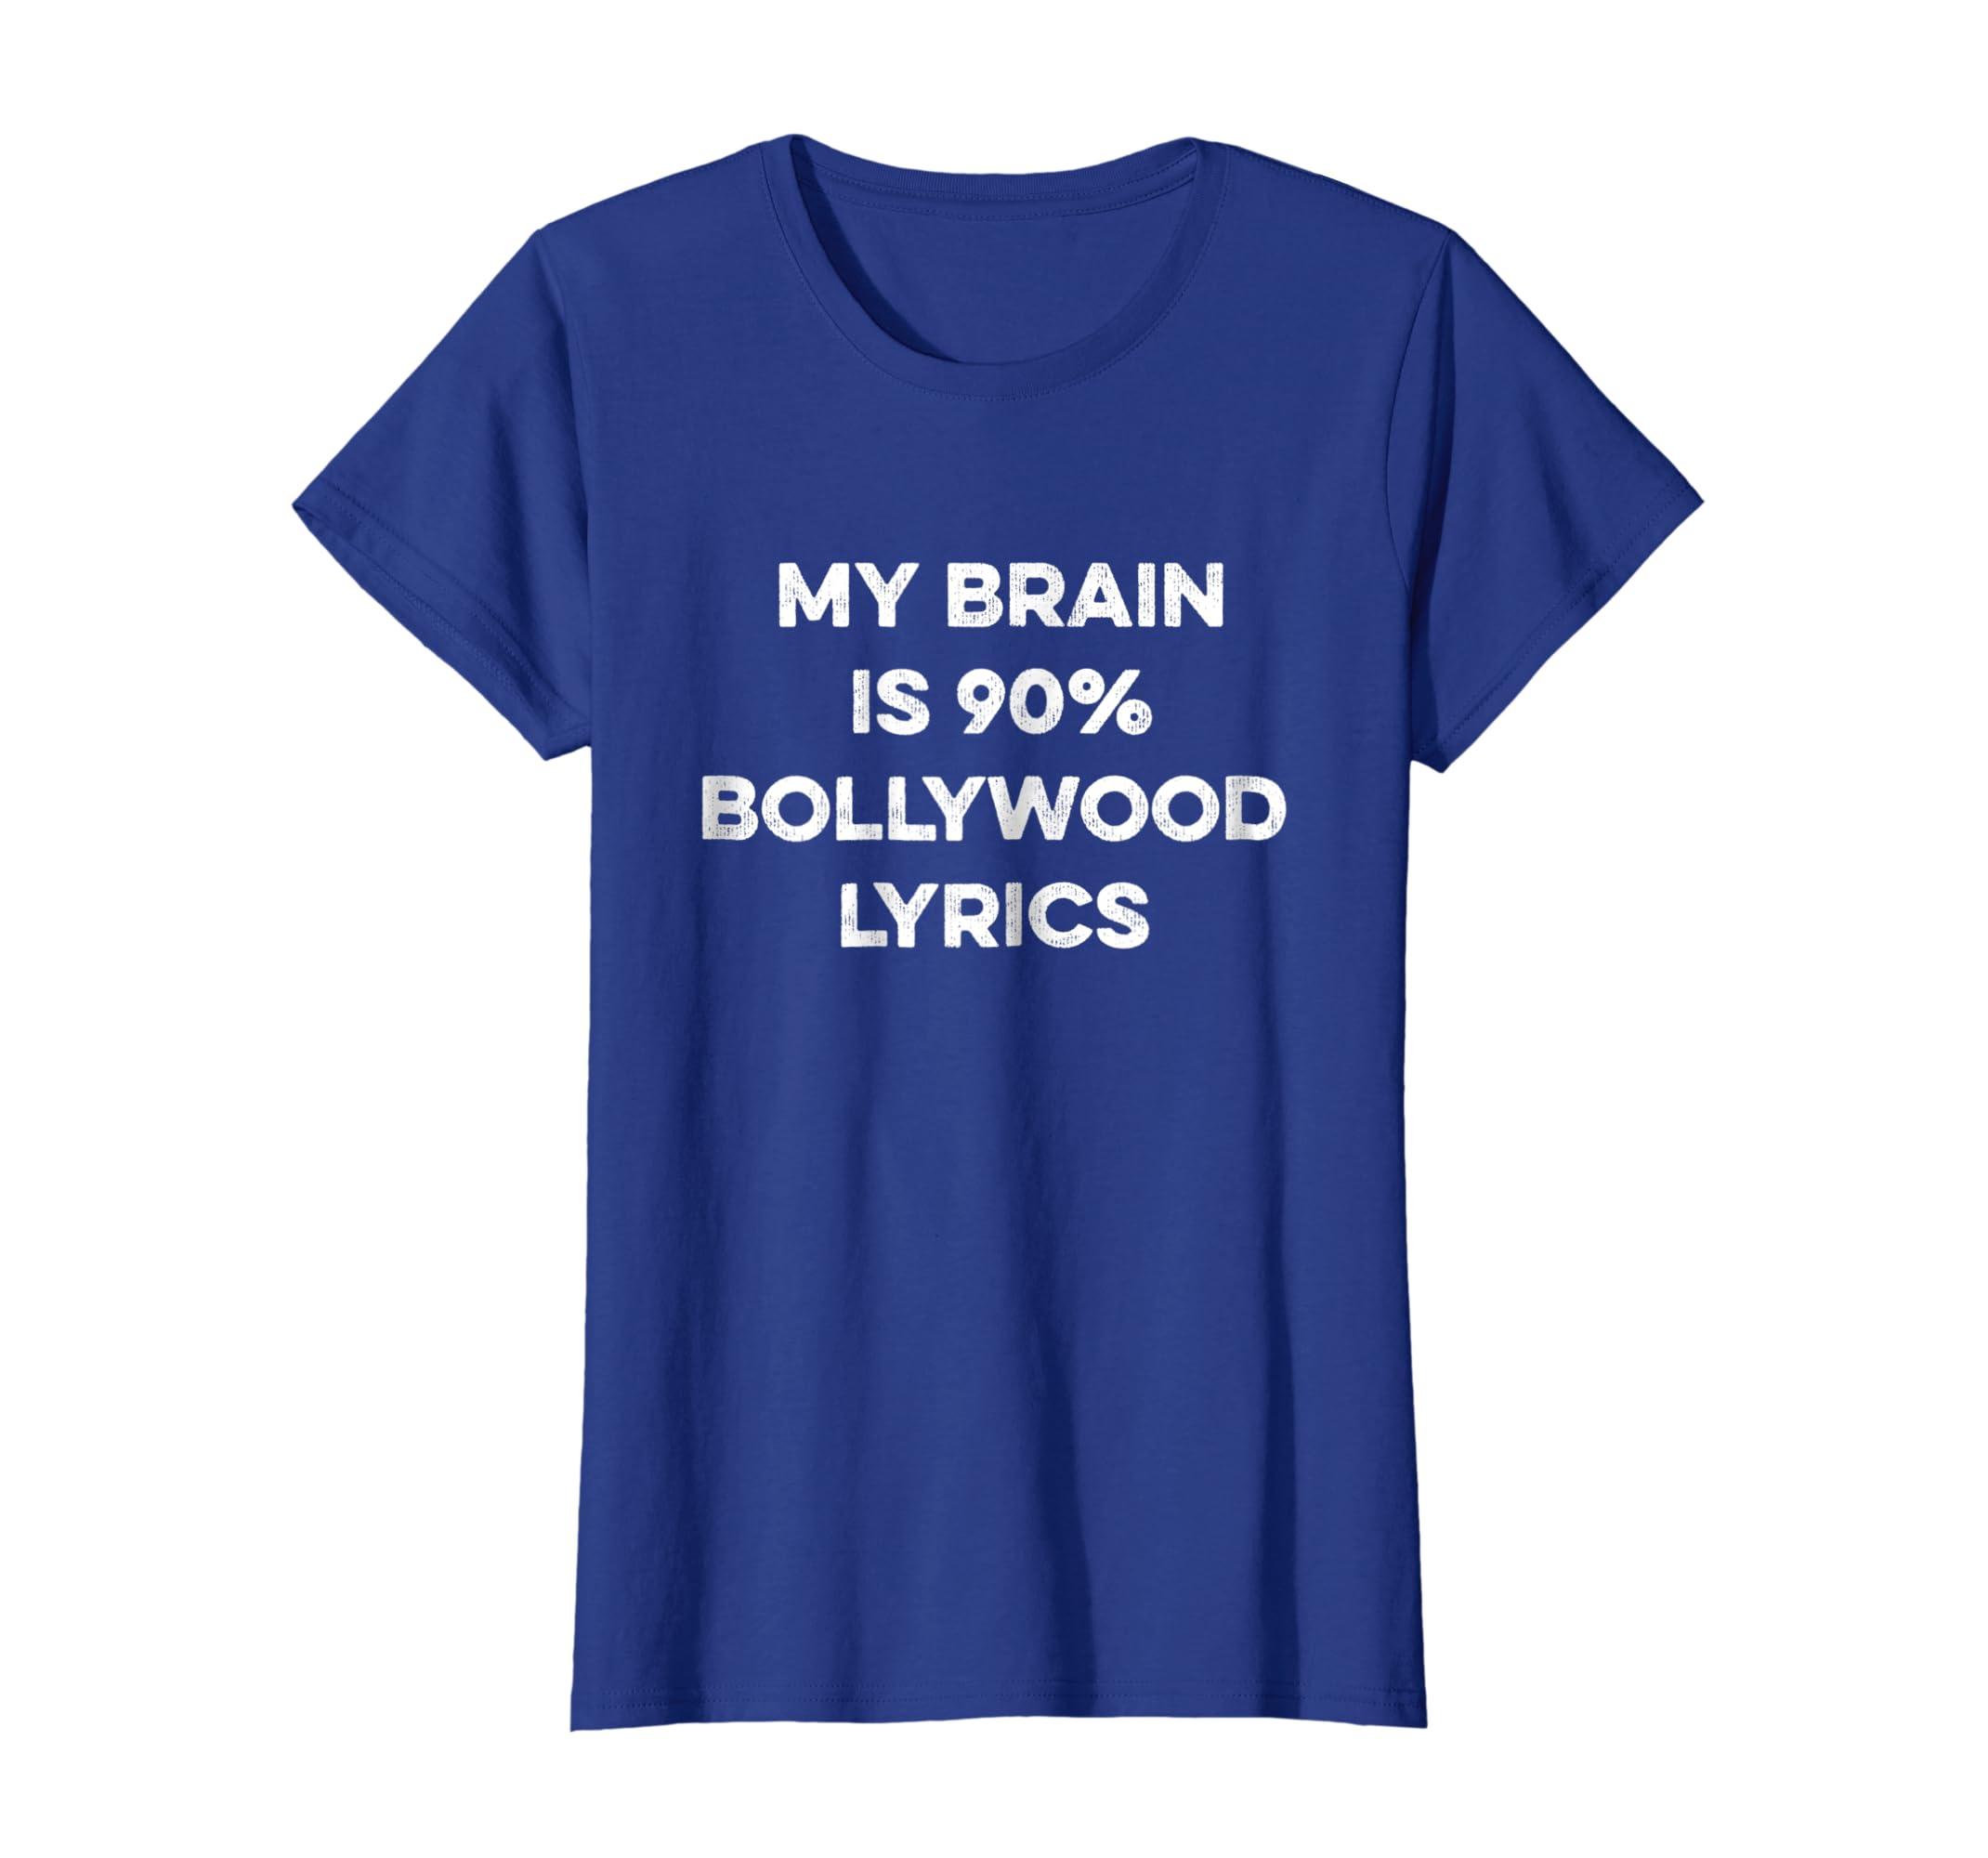 a03828d8 Amazon.com: Funny Bollywood Shirt Song Lyrics Dancing Indian Gift Tshirt:  Clothing